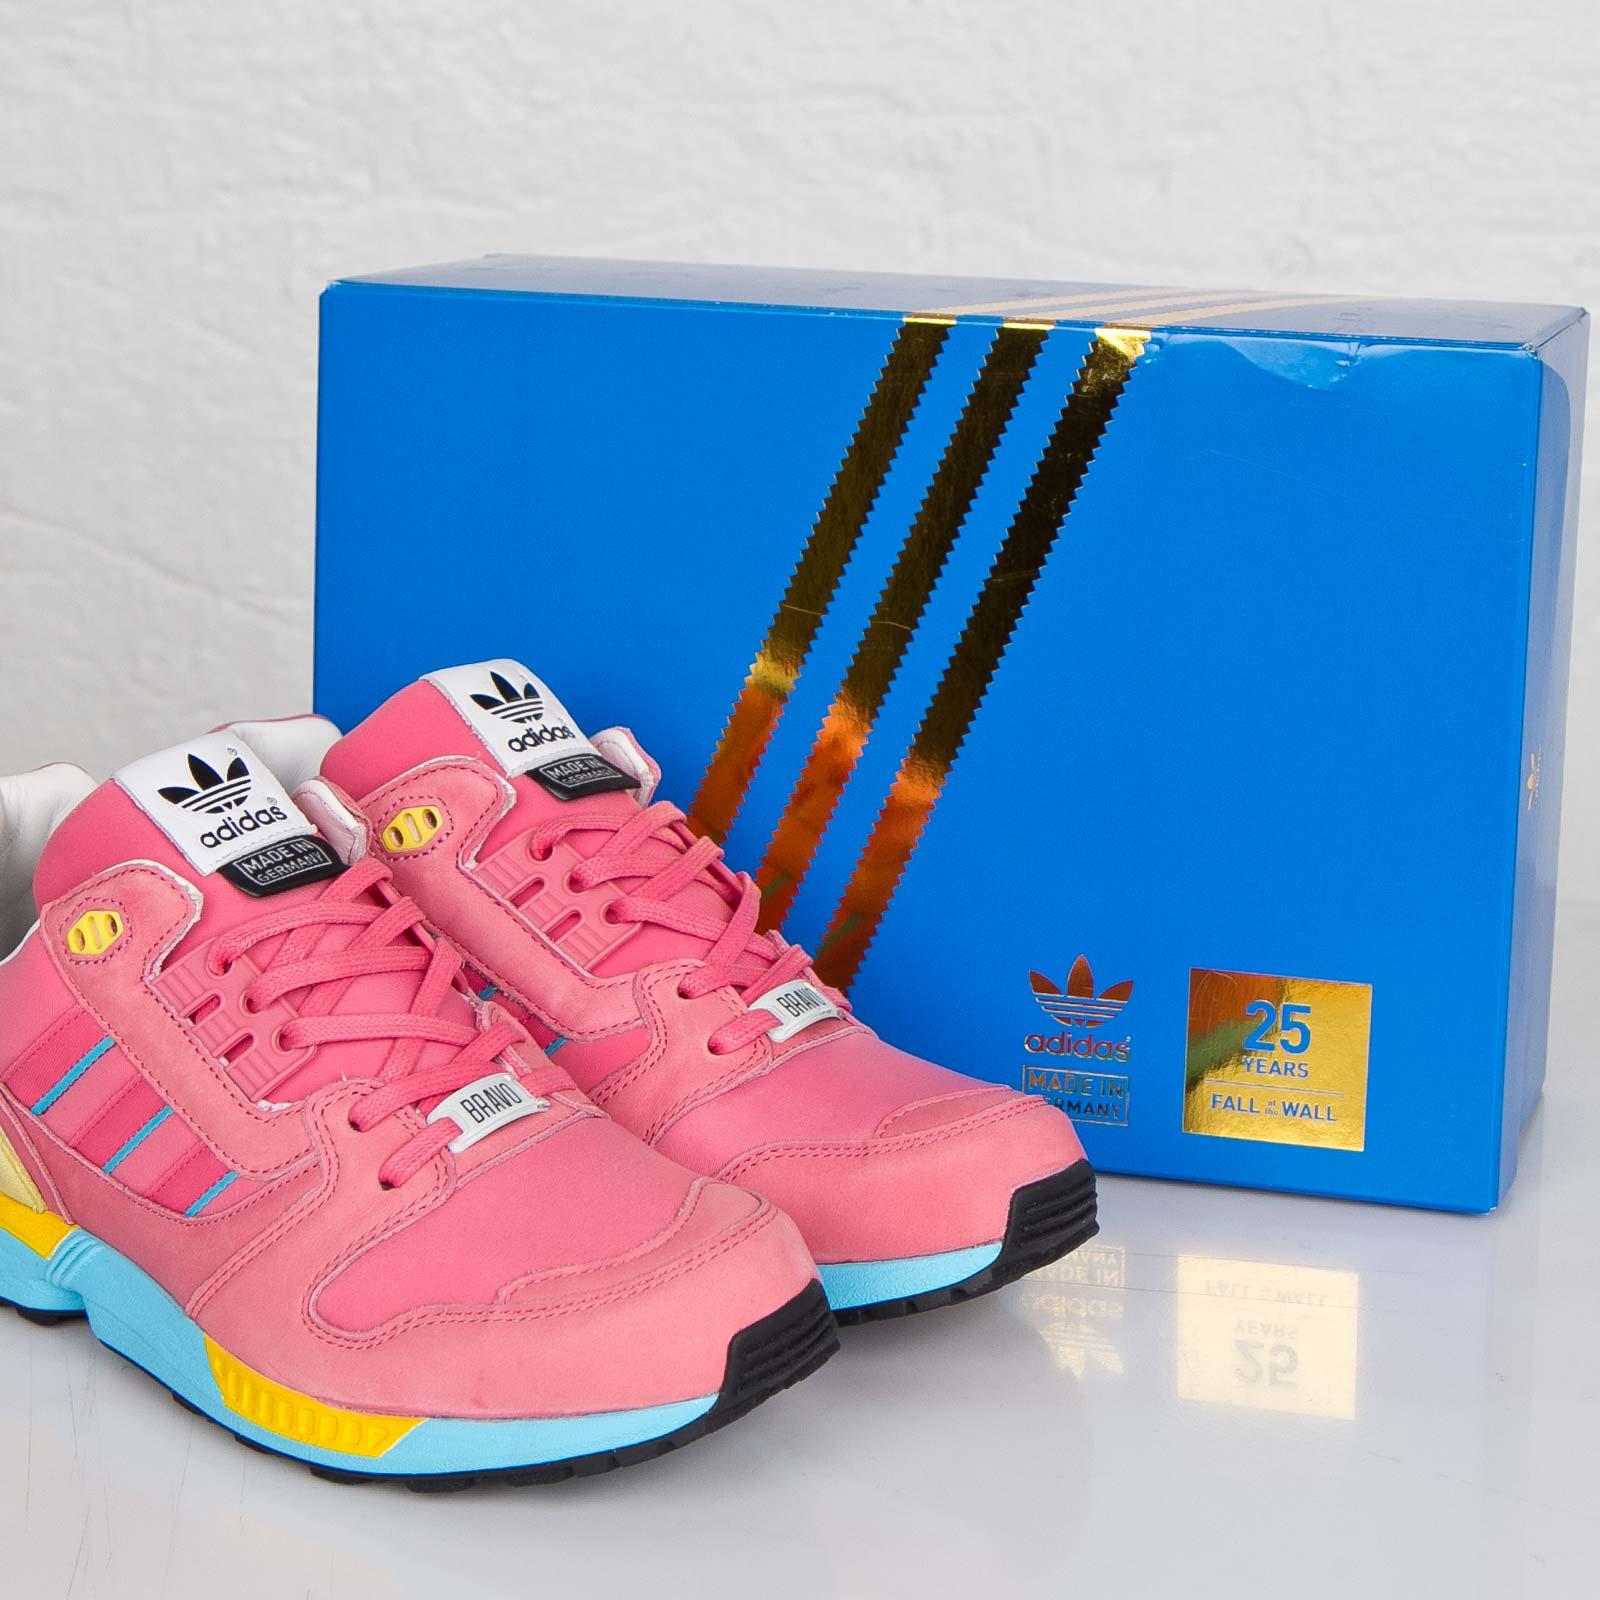 7bbe5d6db38c3 adidas ZX 8000 Bravo - M18629 - Sneakersnstuff